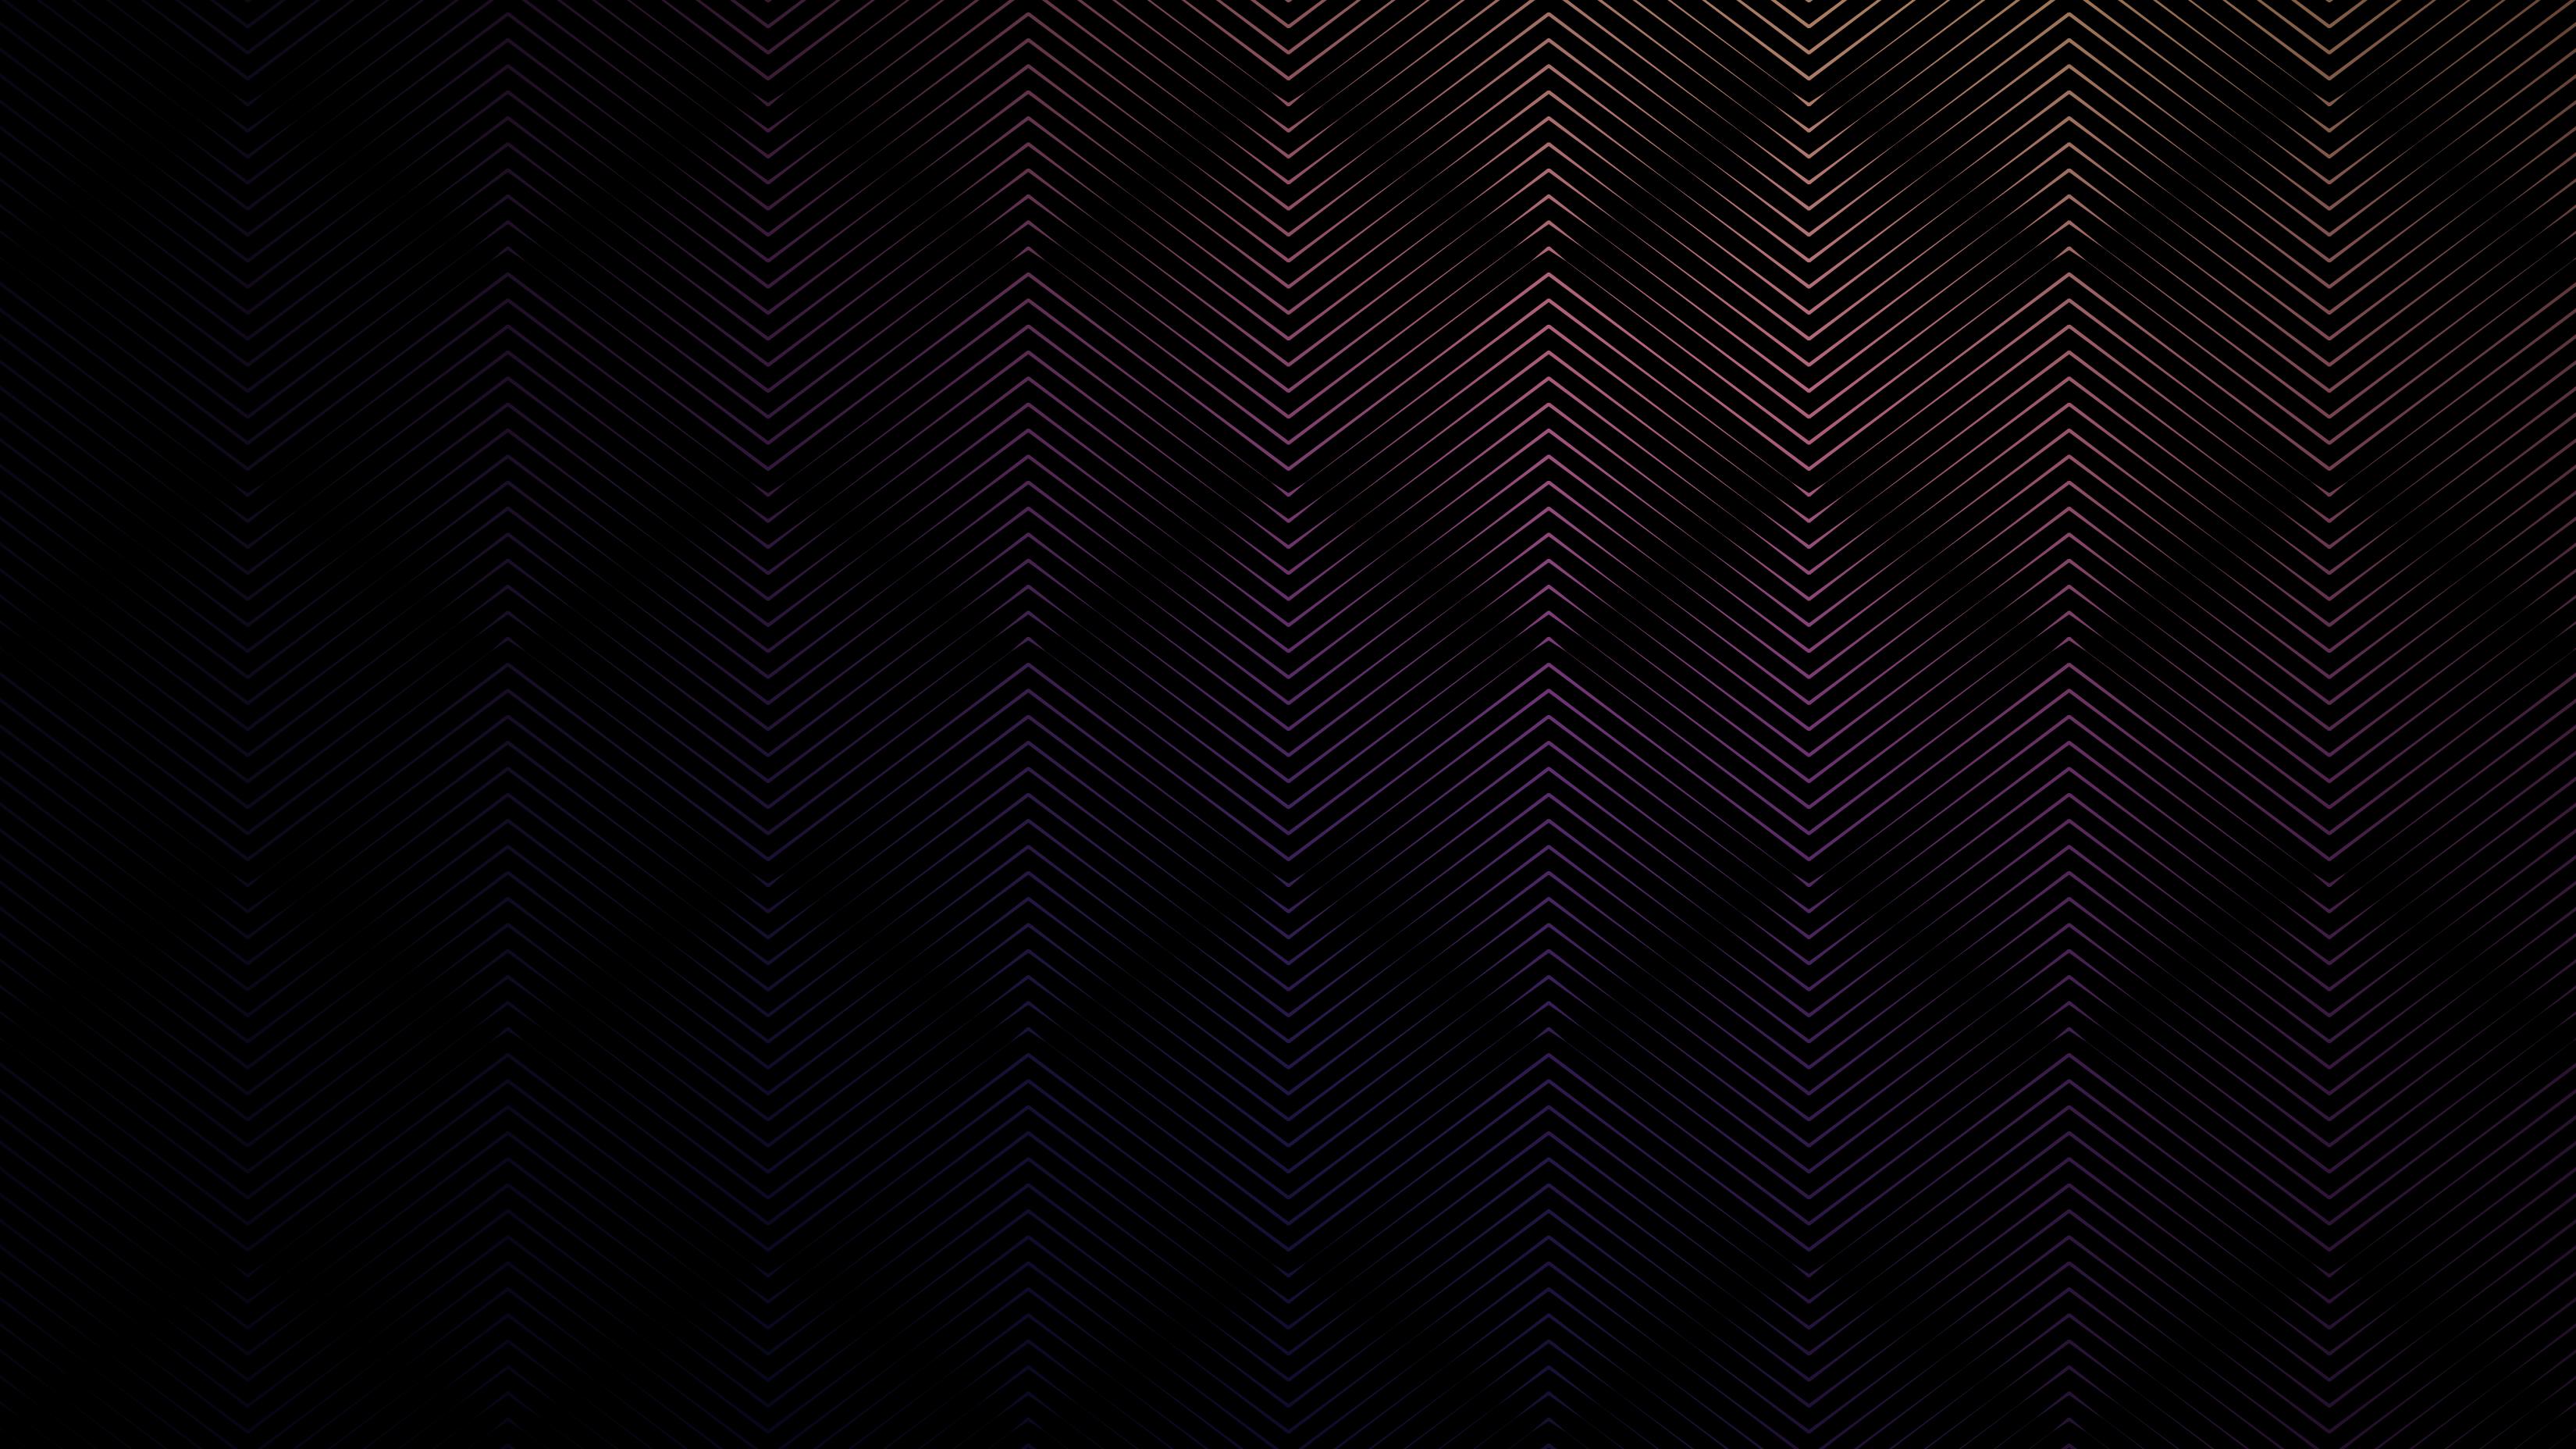 General 3300x1856 artwork lines dark abstract